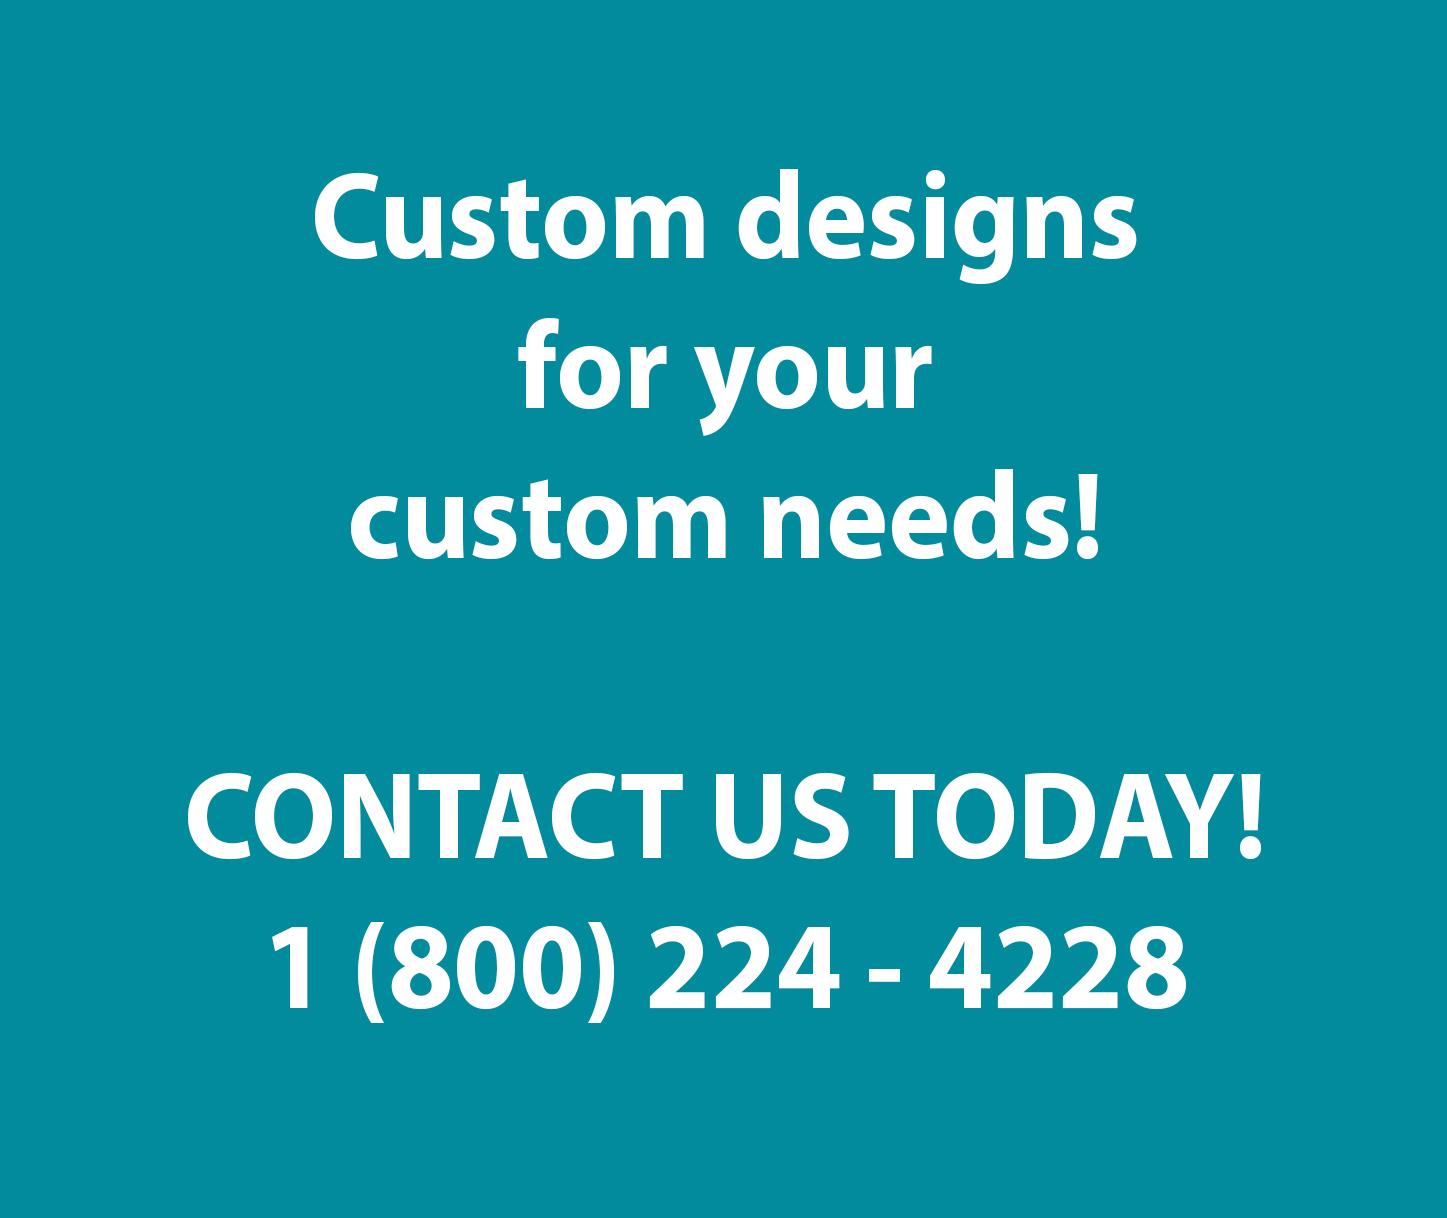 CustomDesignBox